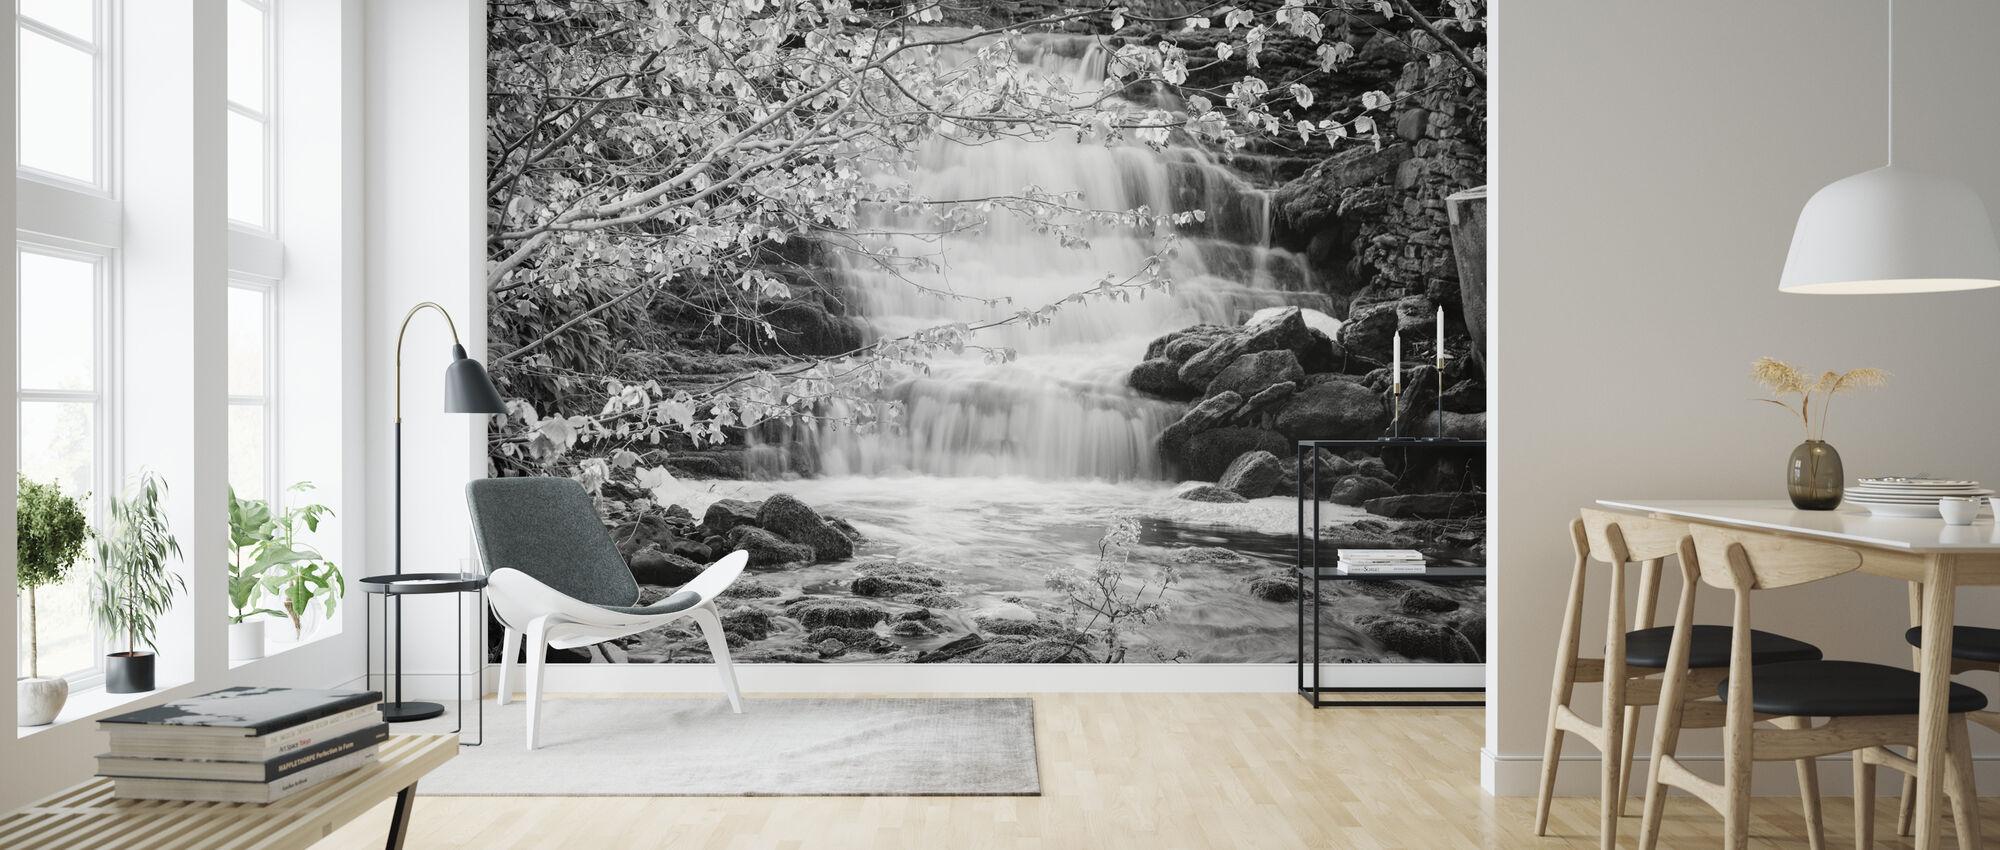 Lummelunda Waterwall - Wallpaper - Living Room